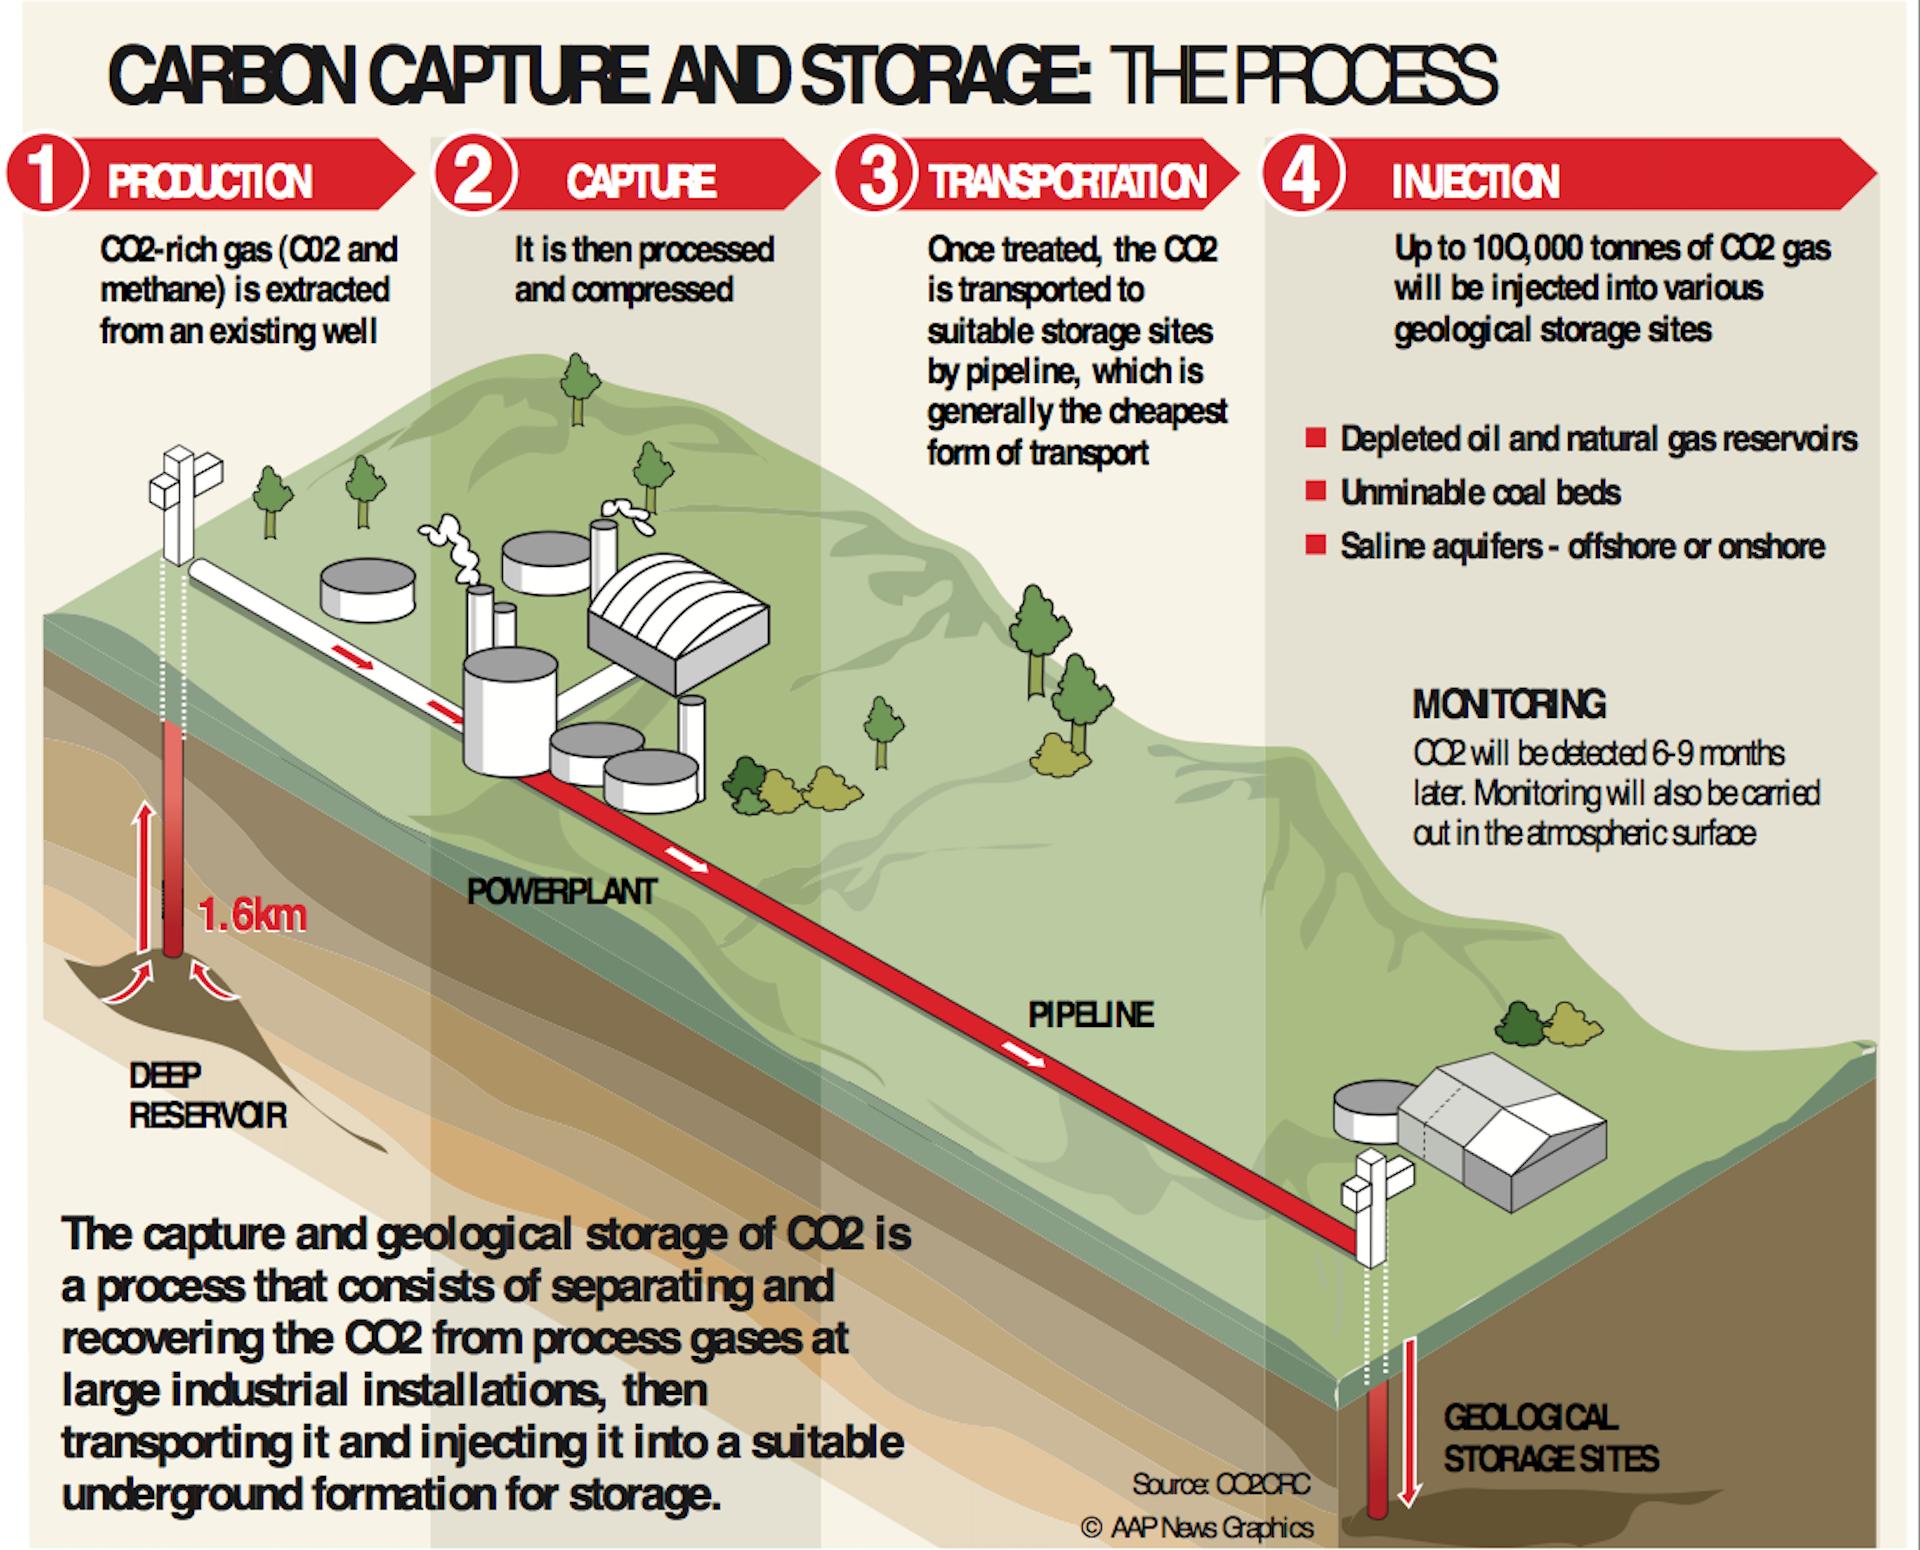 Carbon Capture and Sequestration (CCS)